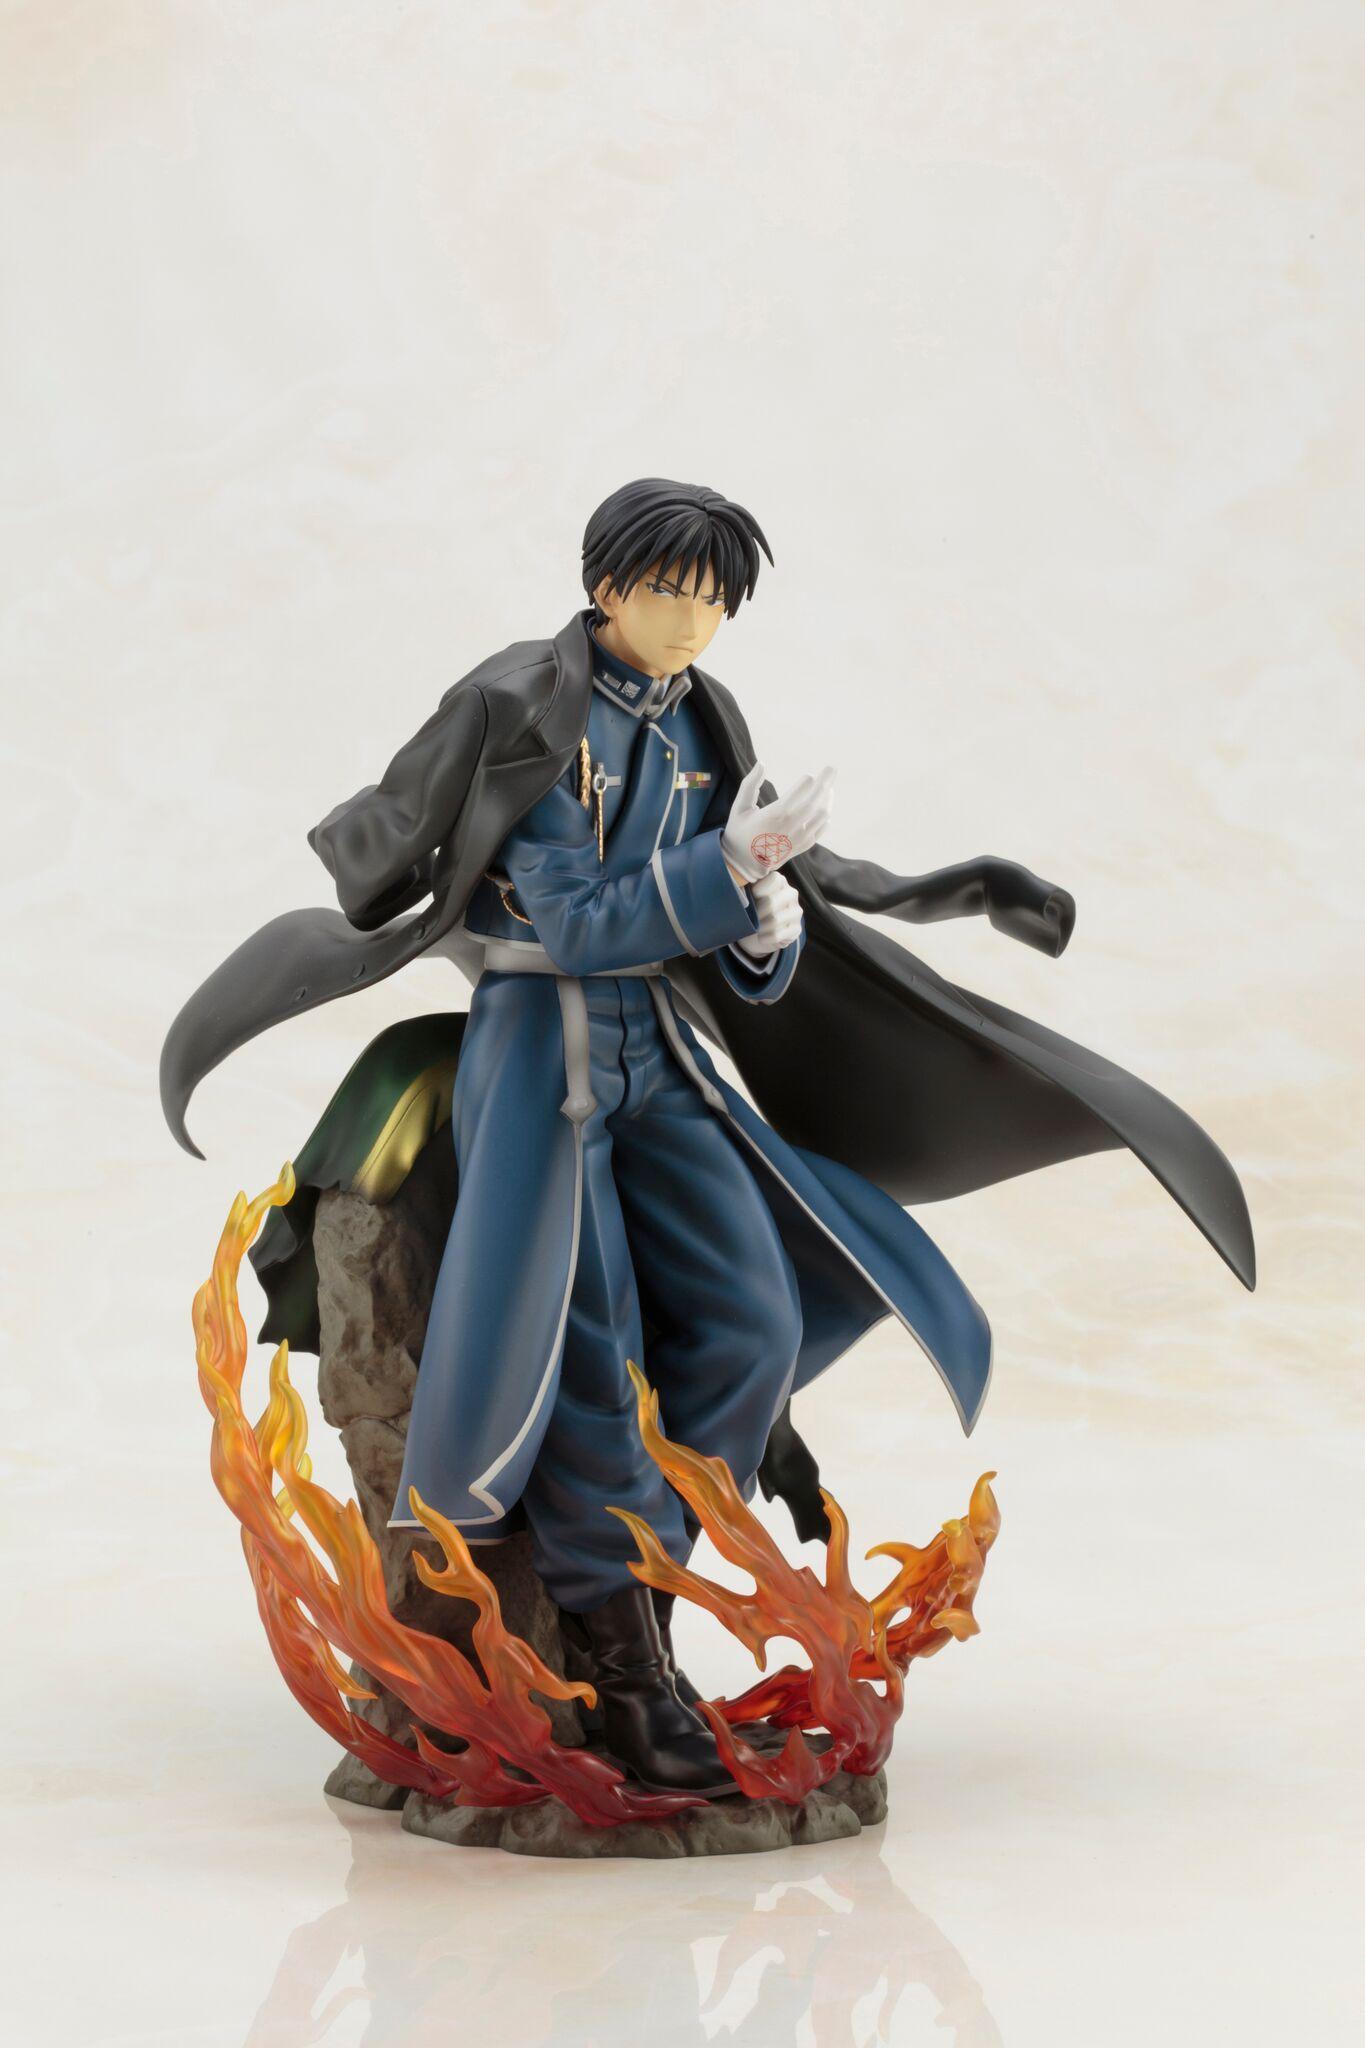 Roy Mustang Fullmetal Alchemist Brotherhood Figure